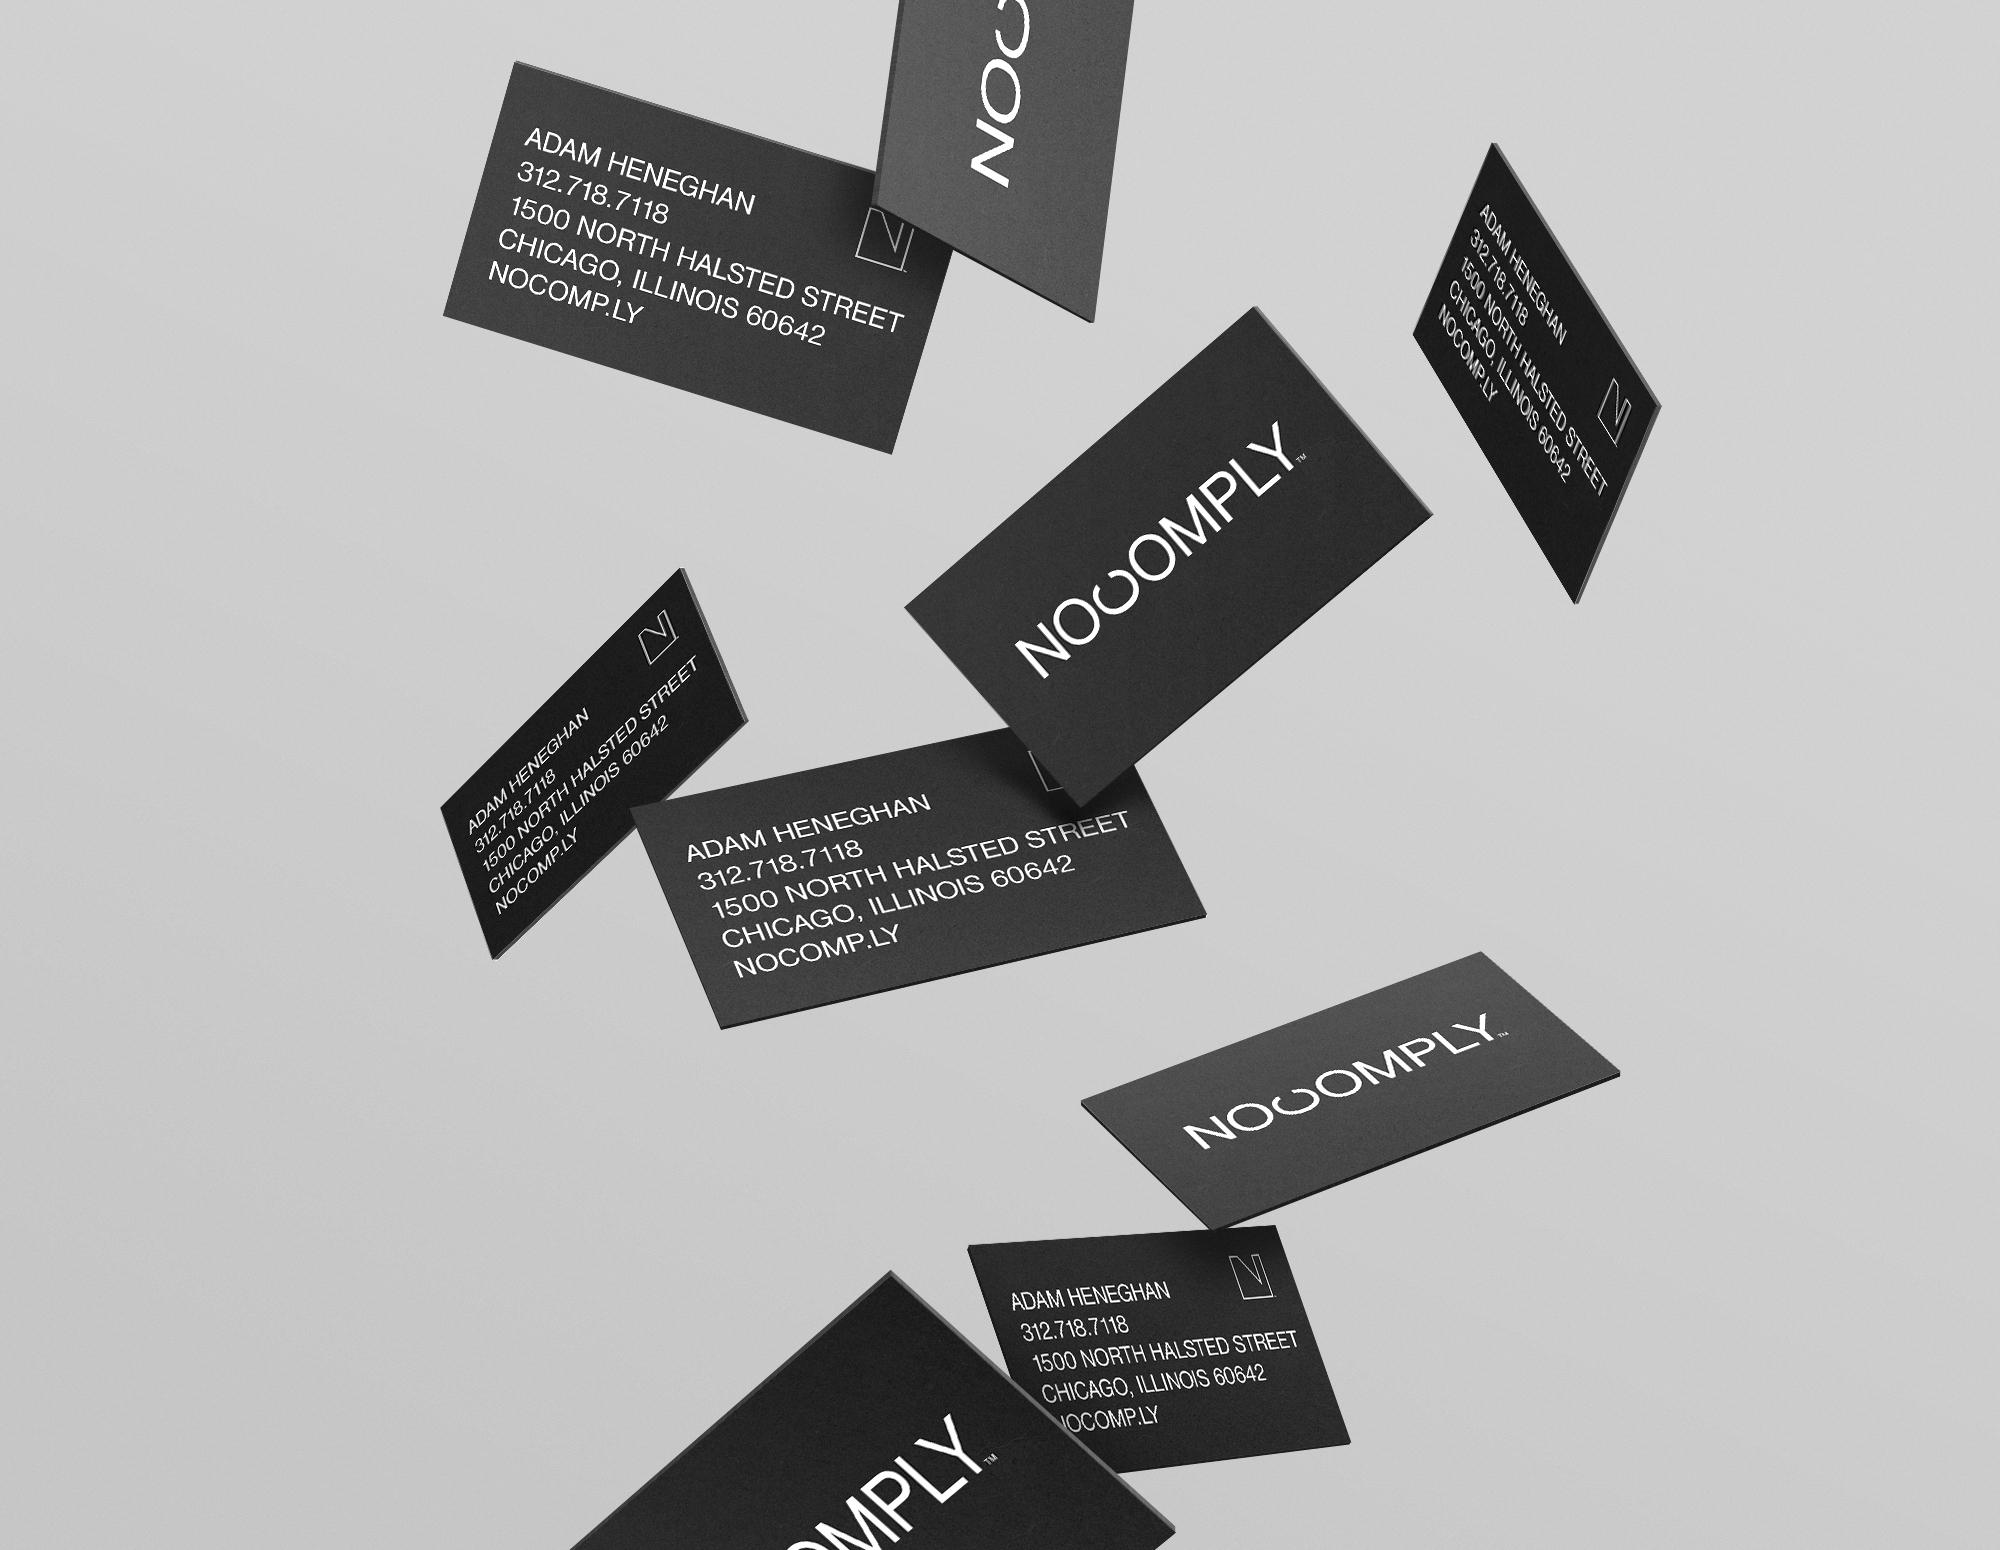 3D_cards_2000w.jpg